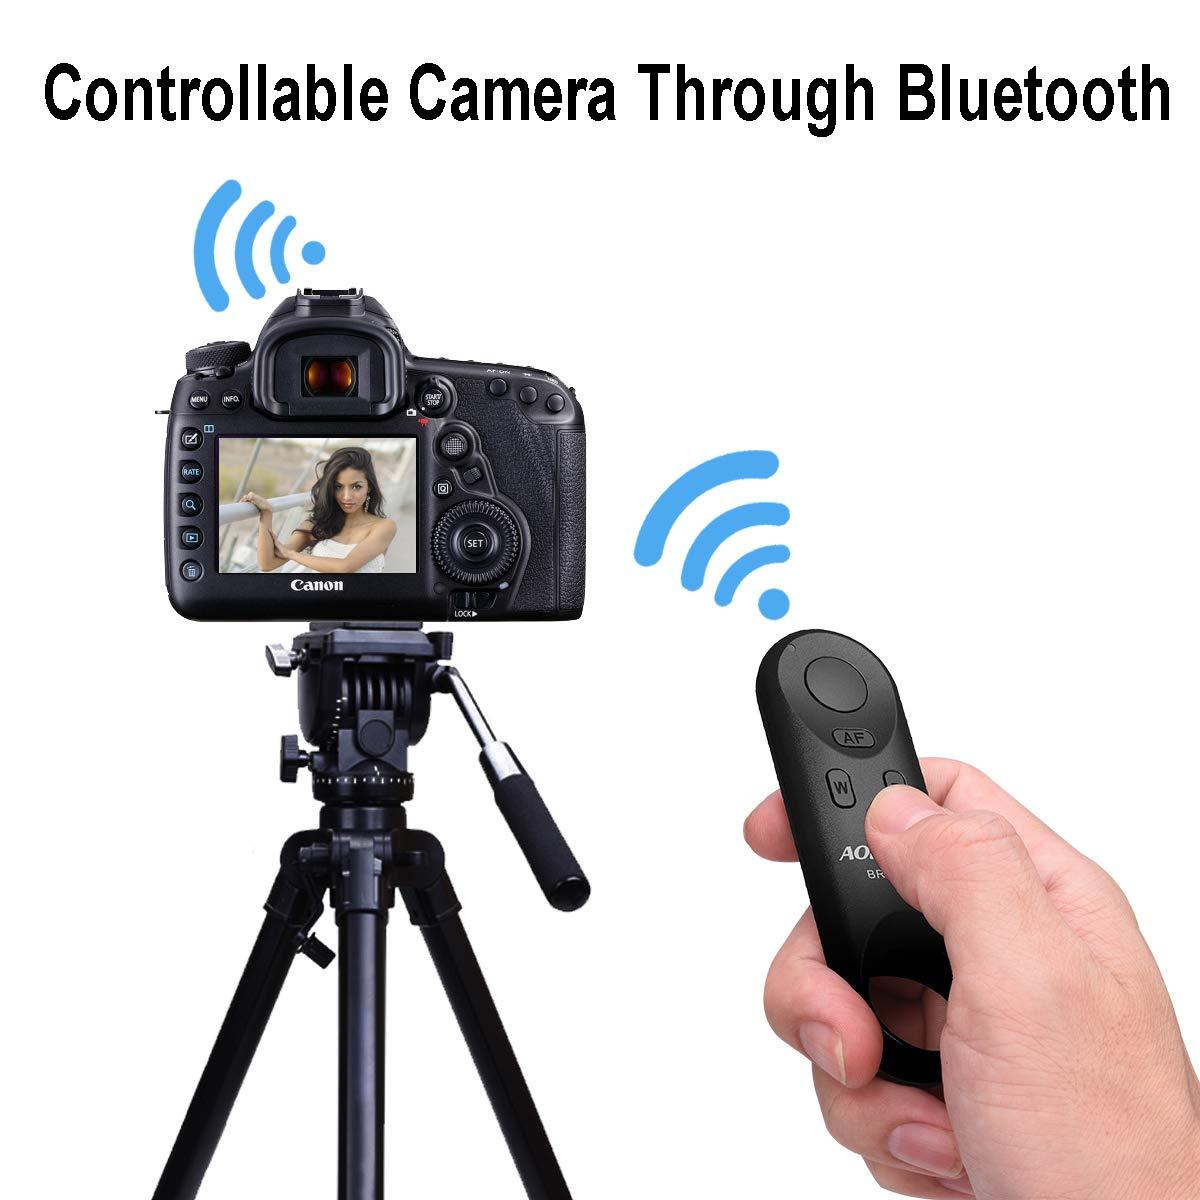 AODELAN Control Remoto inal/ámbrico Controlador de c/ámara Control Remoto de Obturador inal/ámbrico BR-E1A Control Remoto para Canon EOS R 77D 6D Mark II 800D 200D EOS RP M50